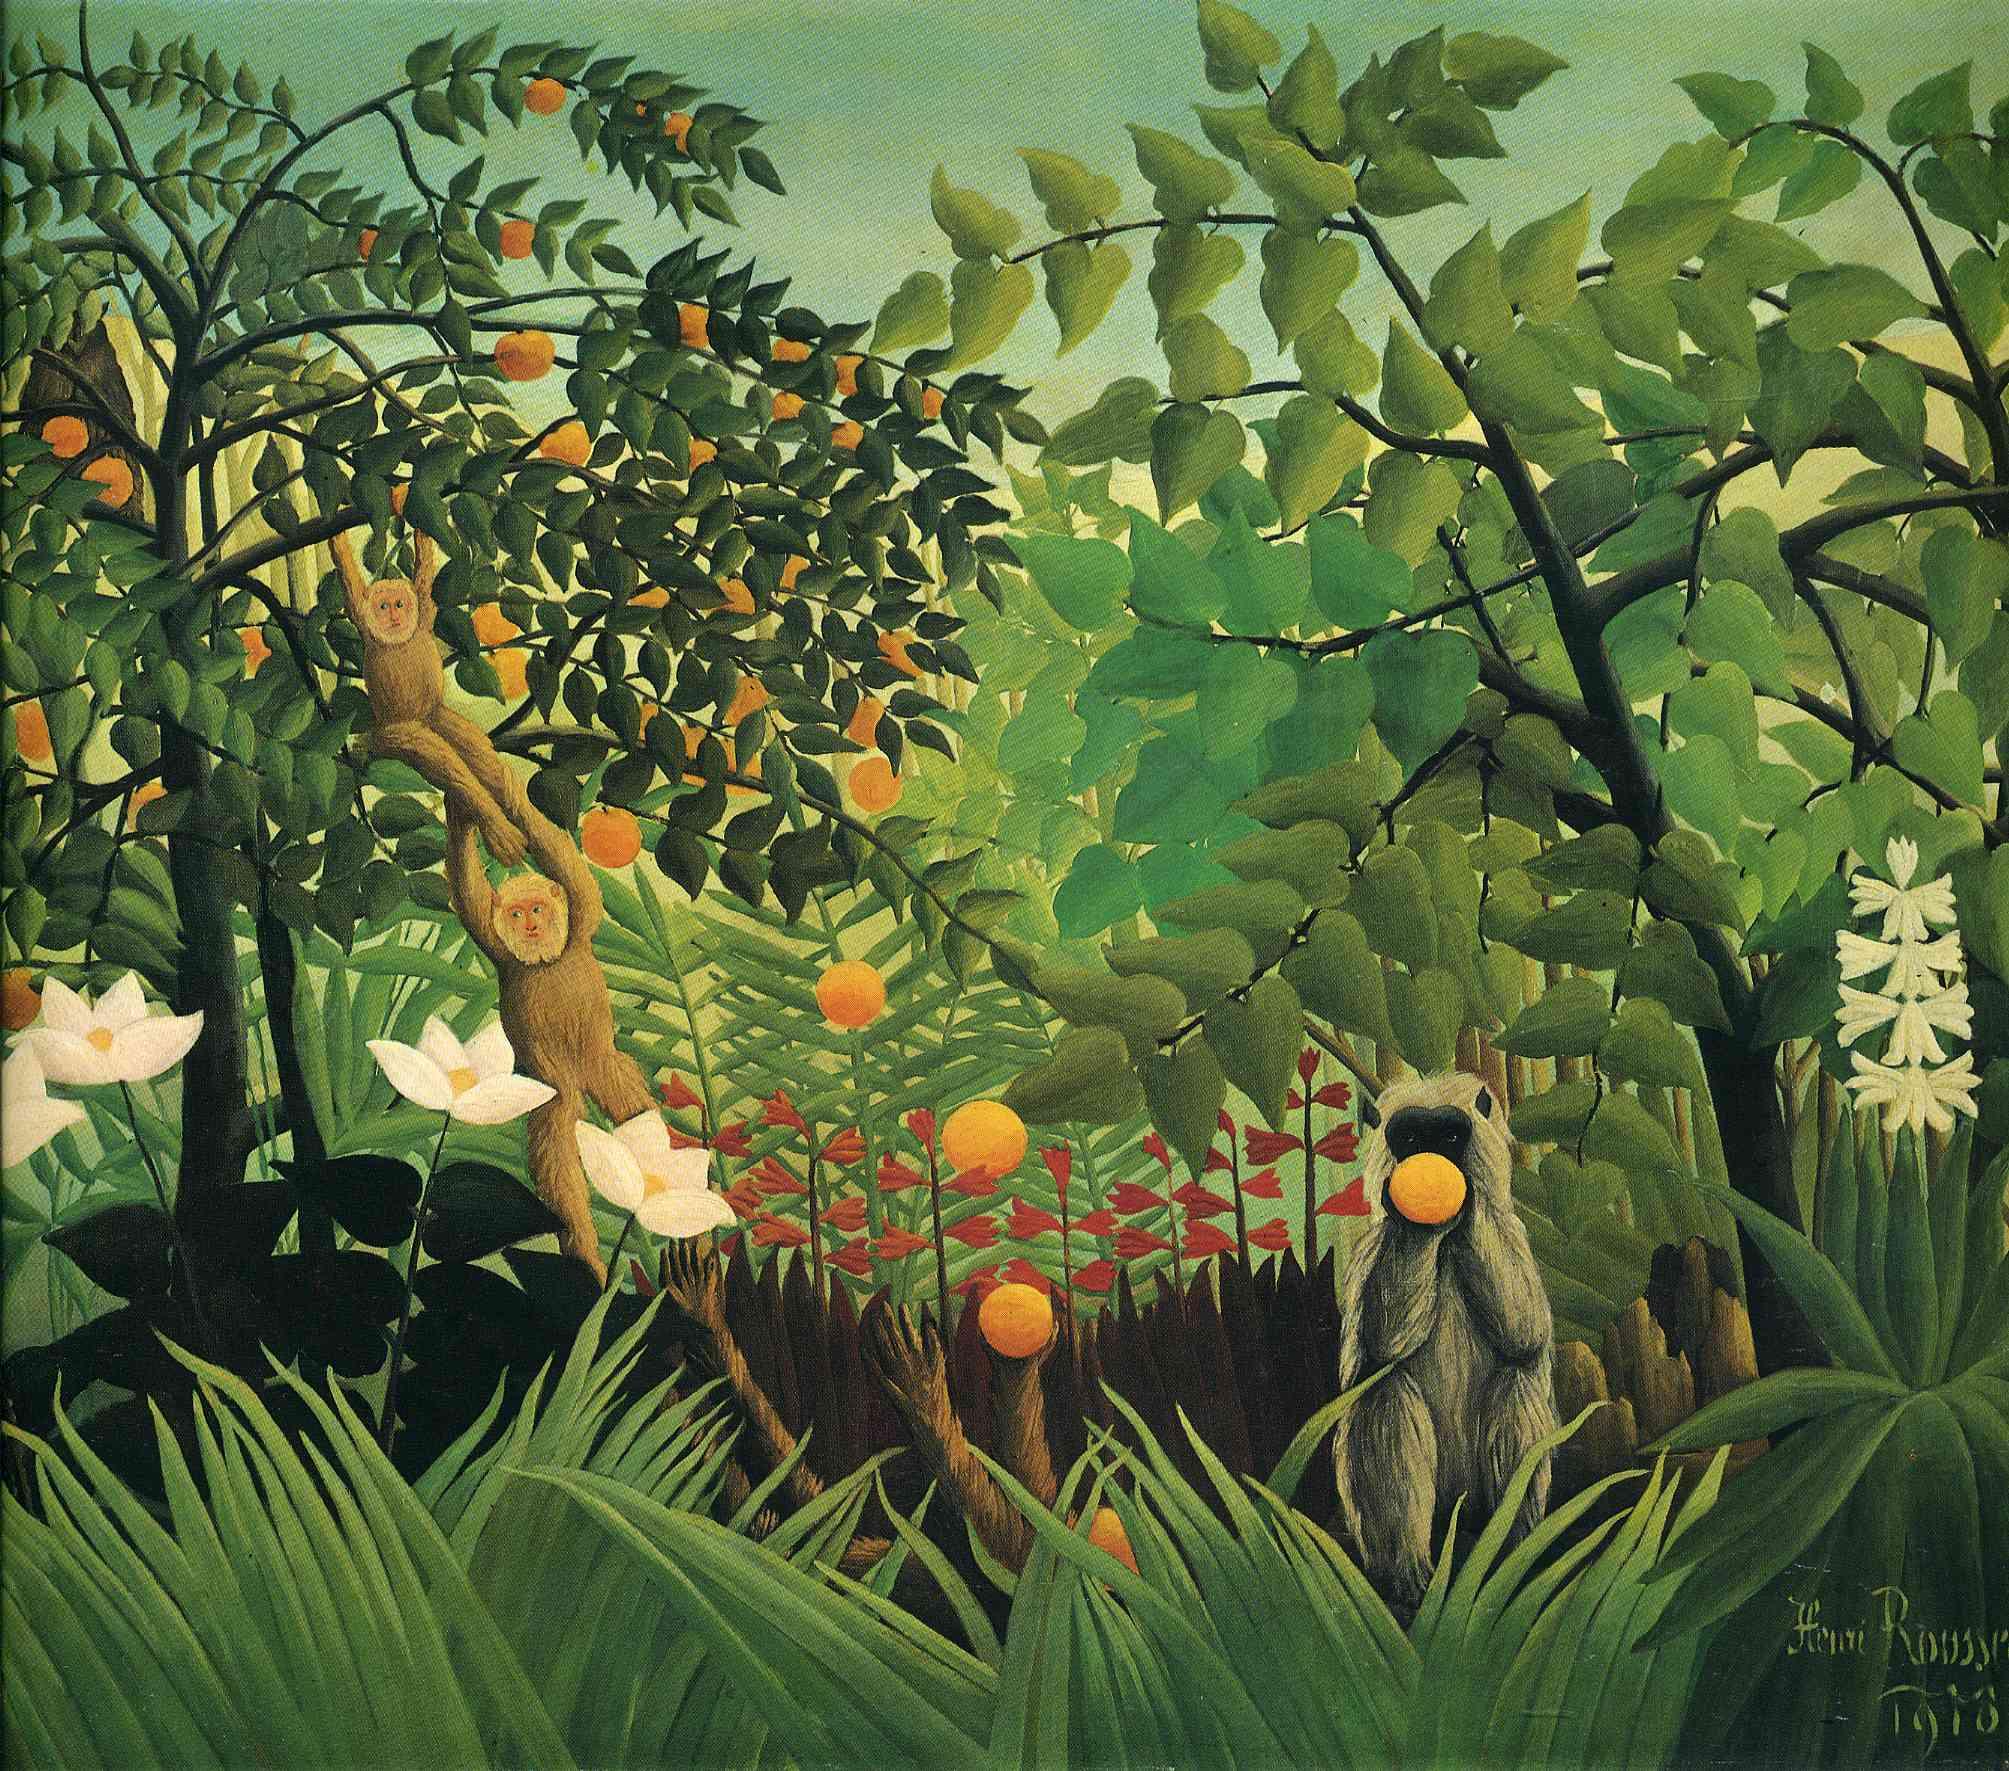 Exotic Landscape, 1910 - Henri Rousseau - WikiArt.org